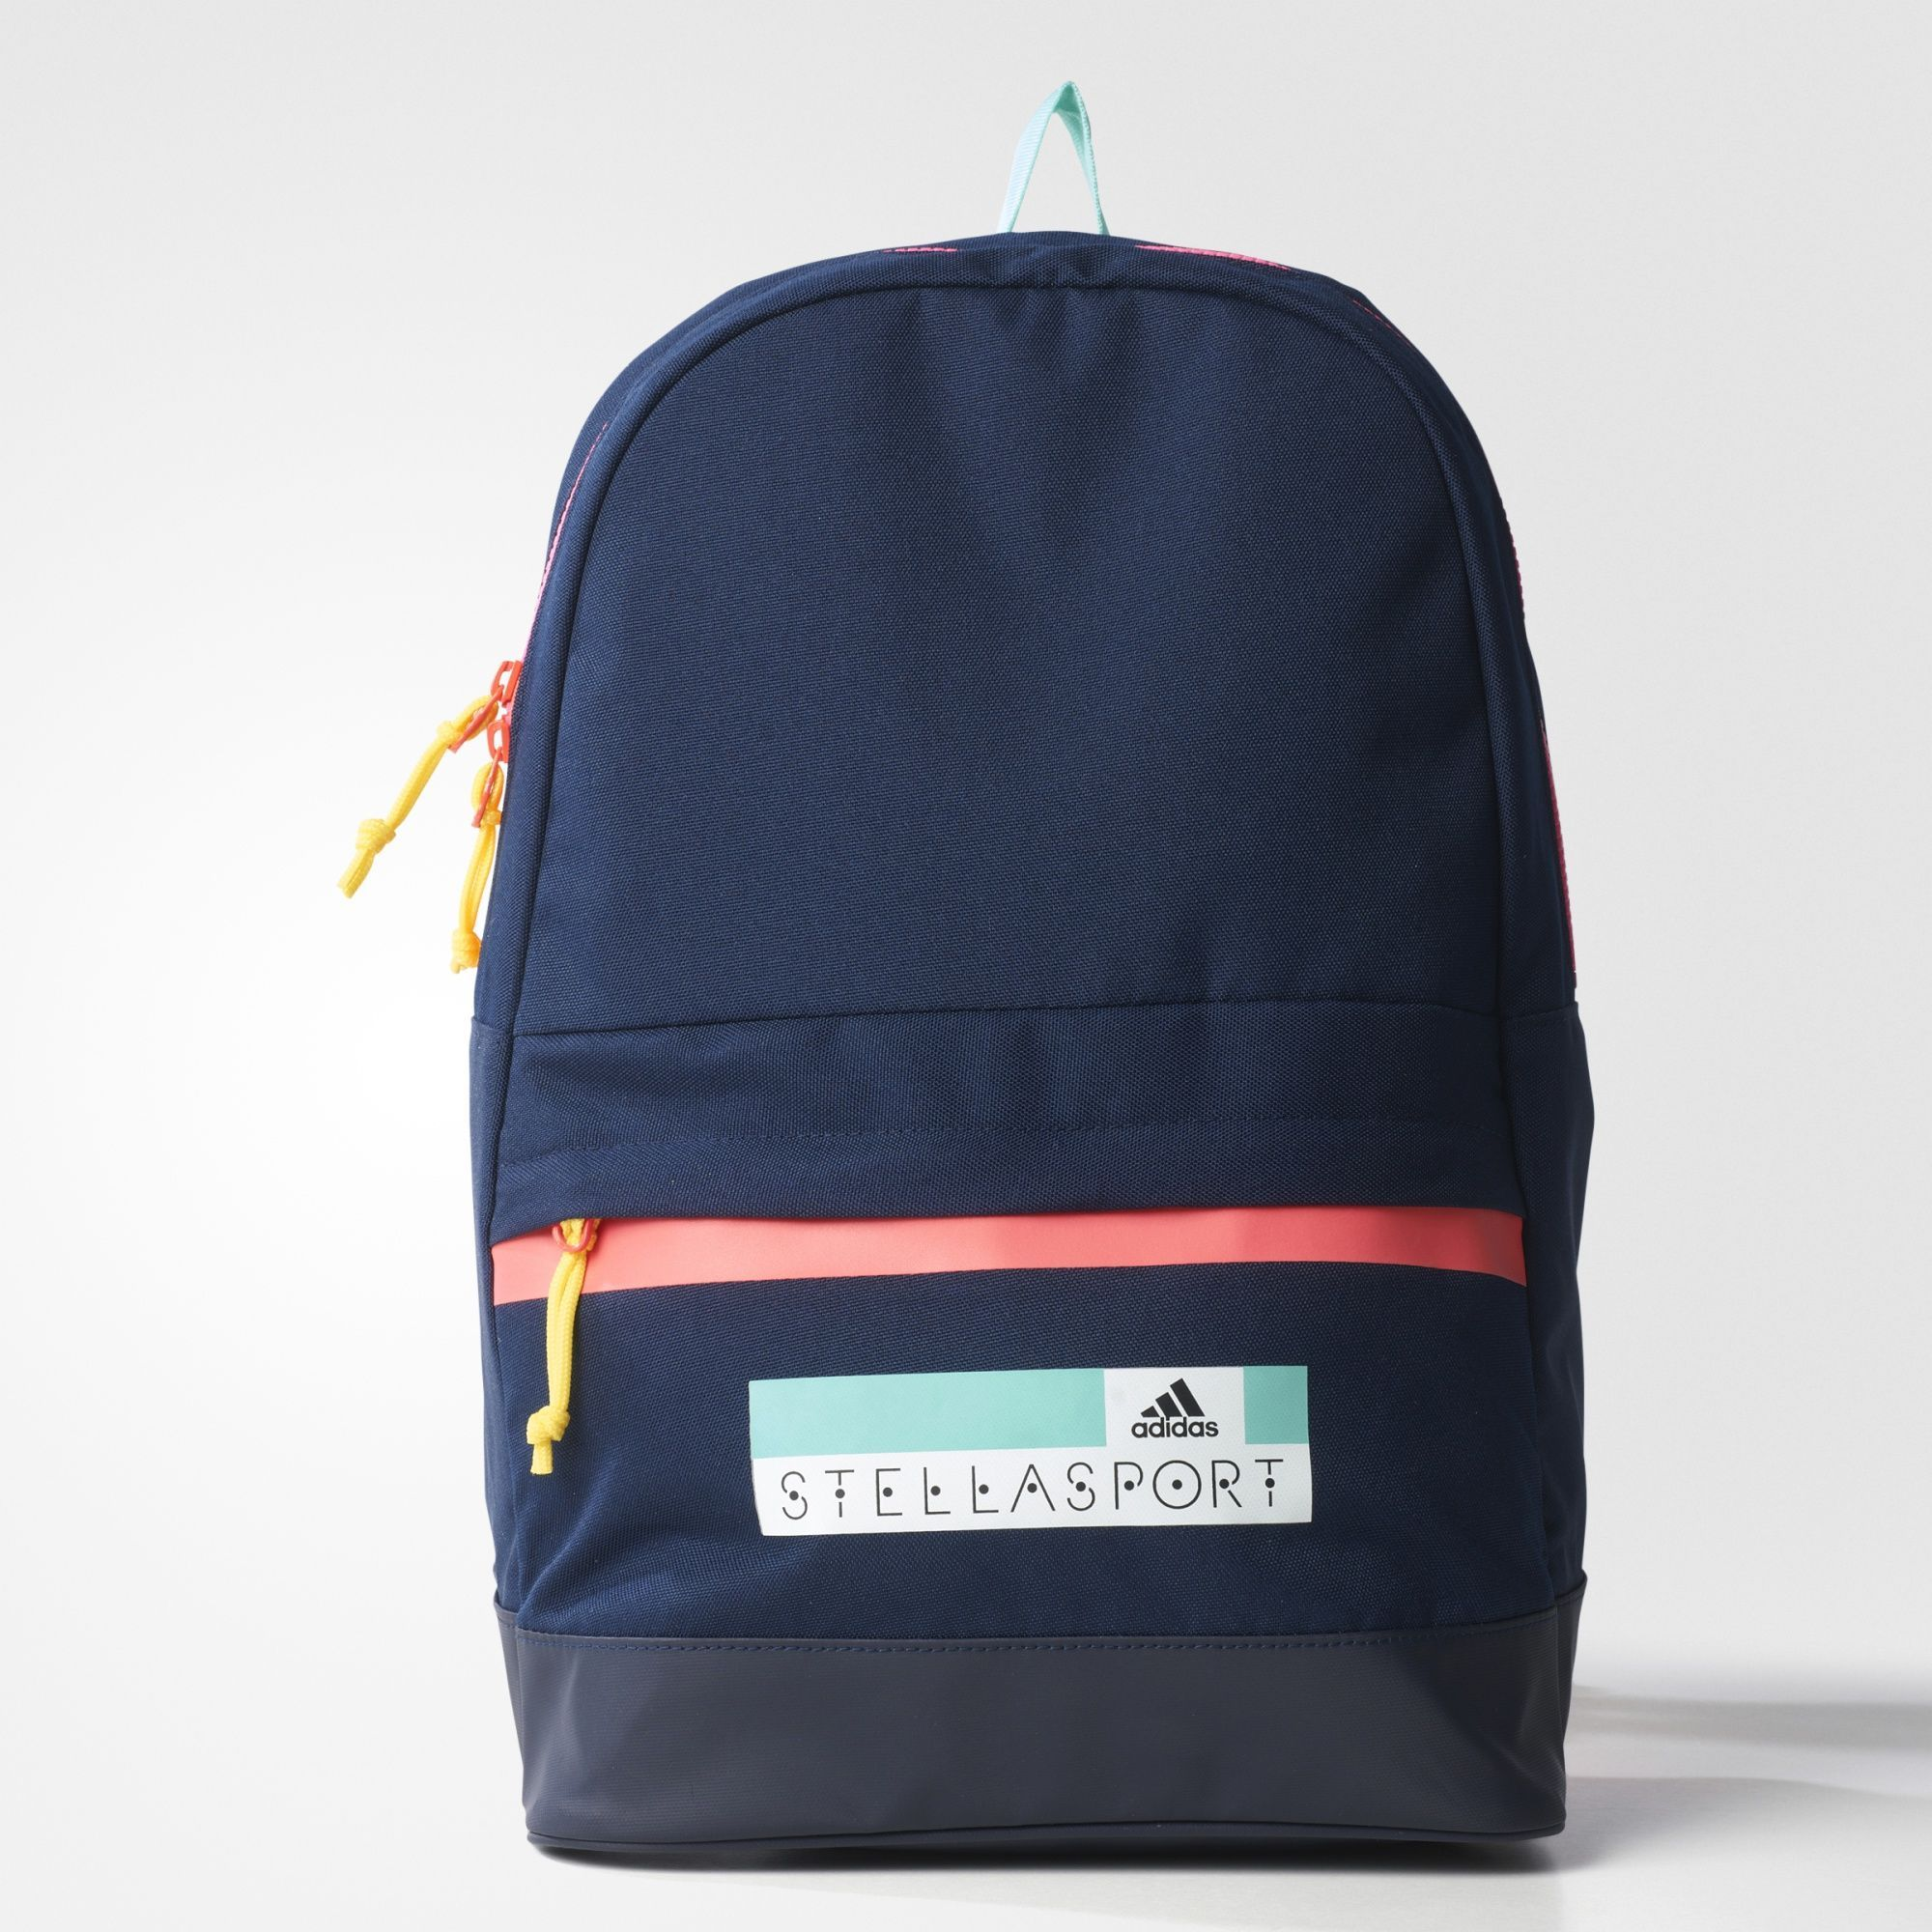 f8c3e04628 adidas - adidas STELLASPORT Backpack